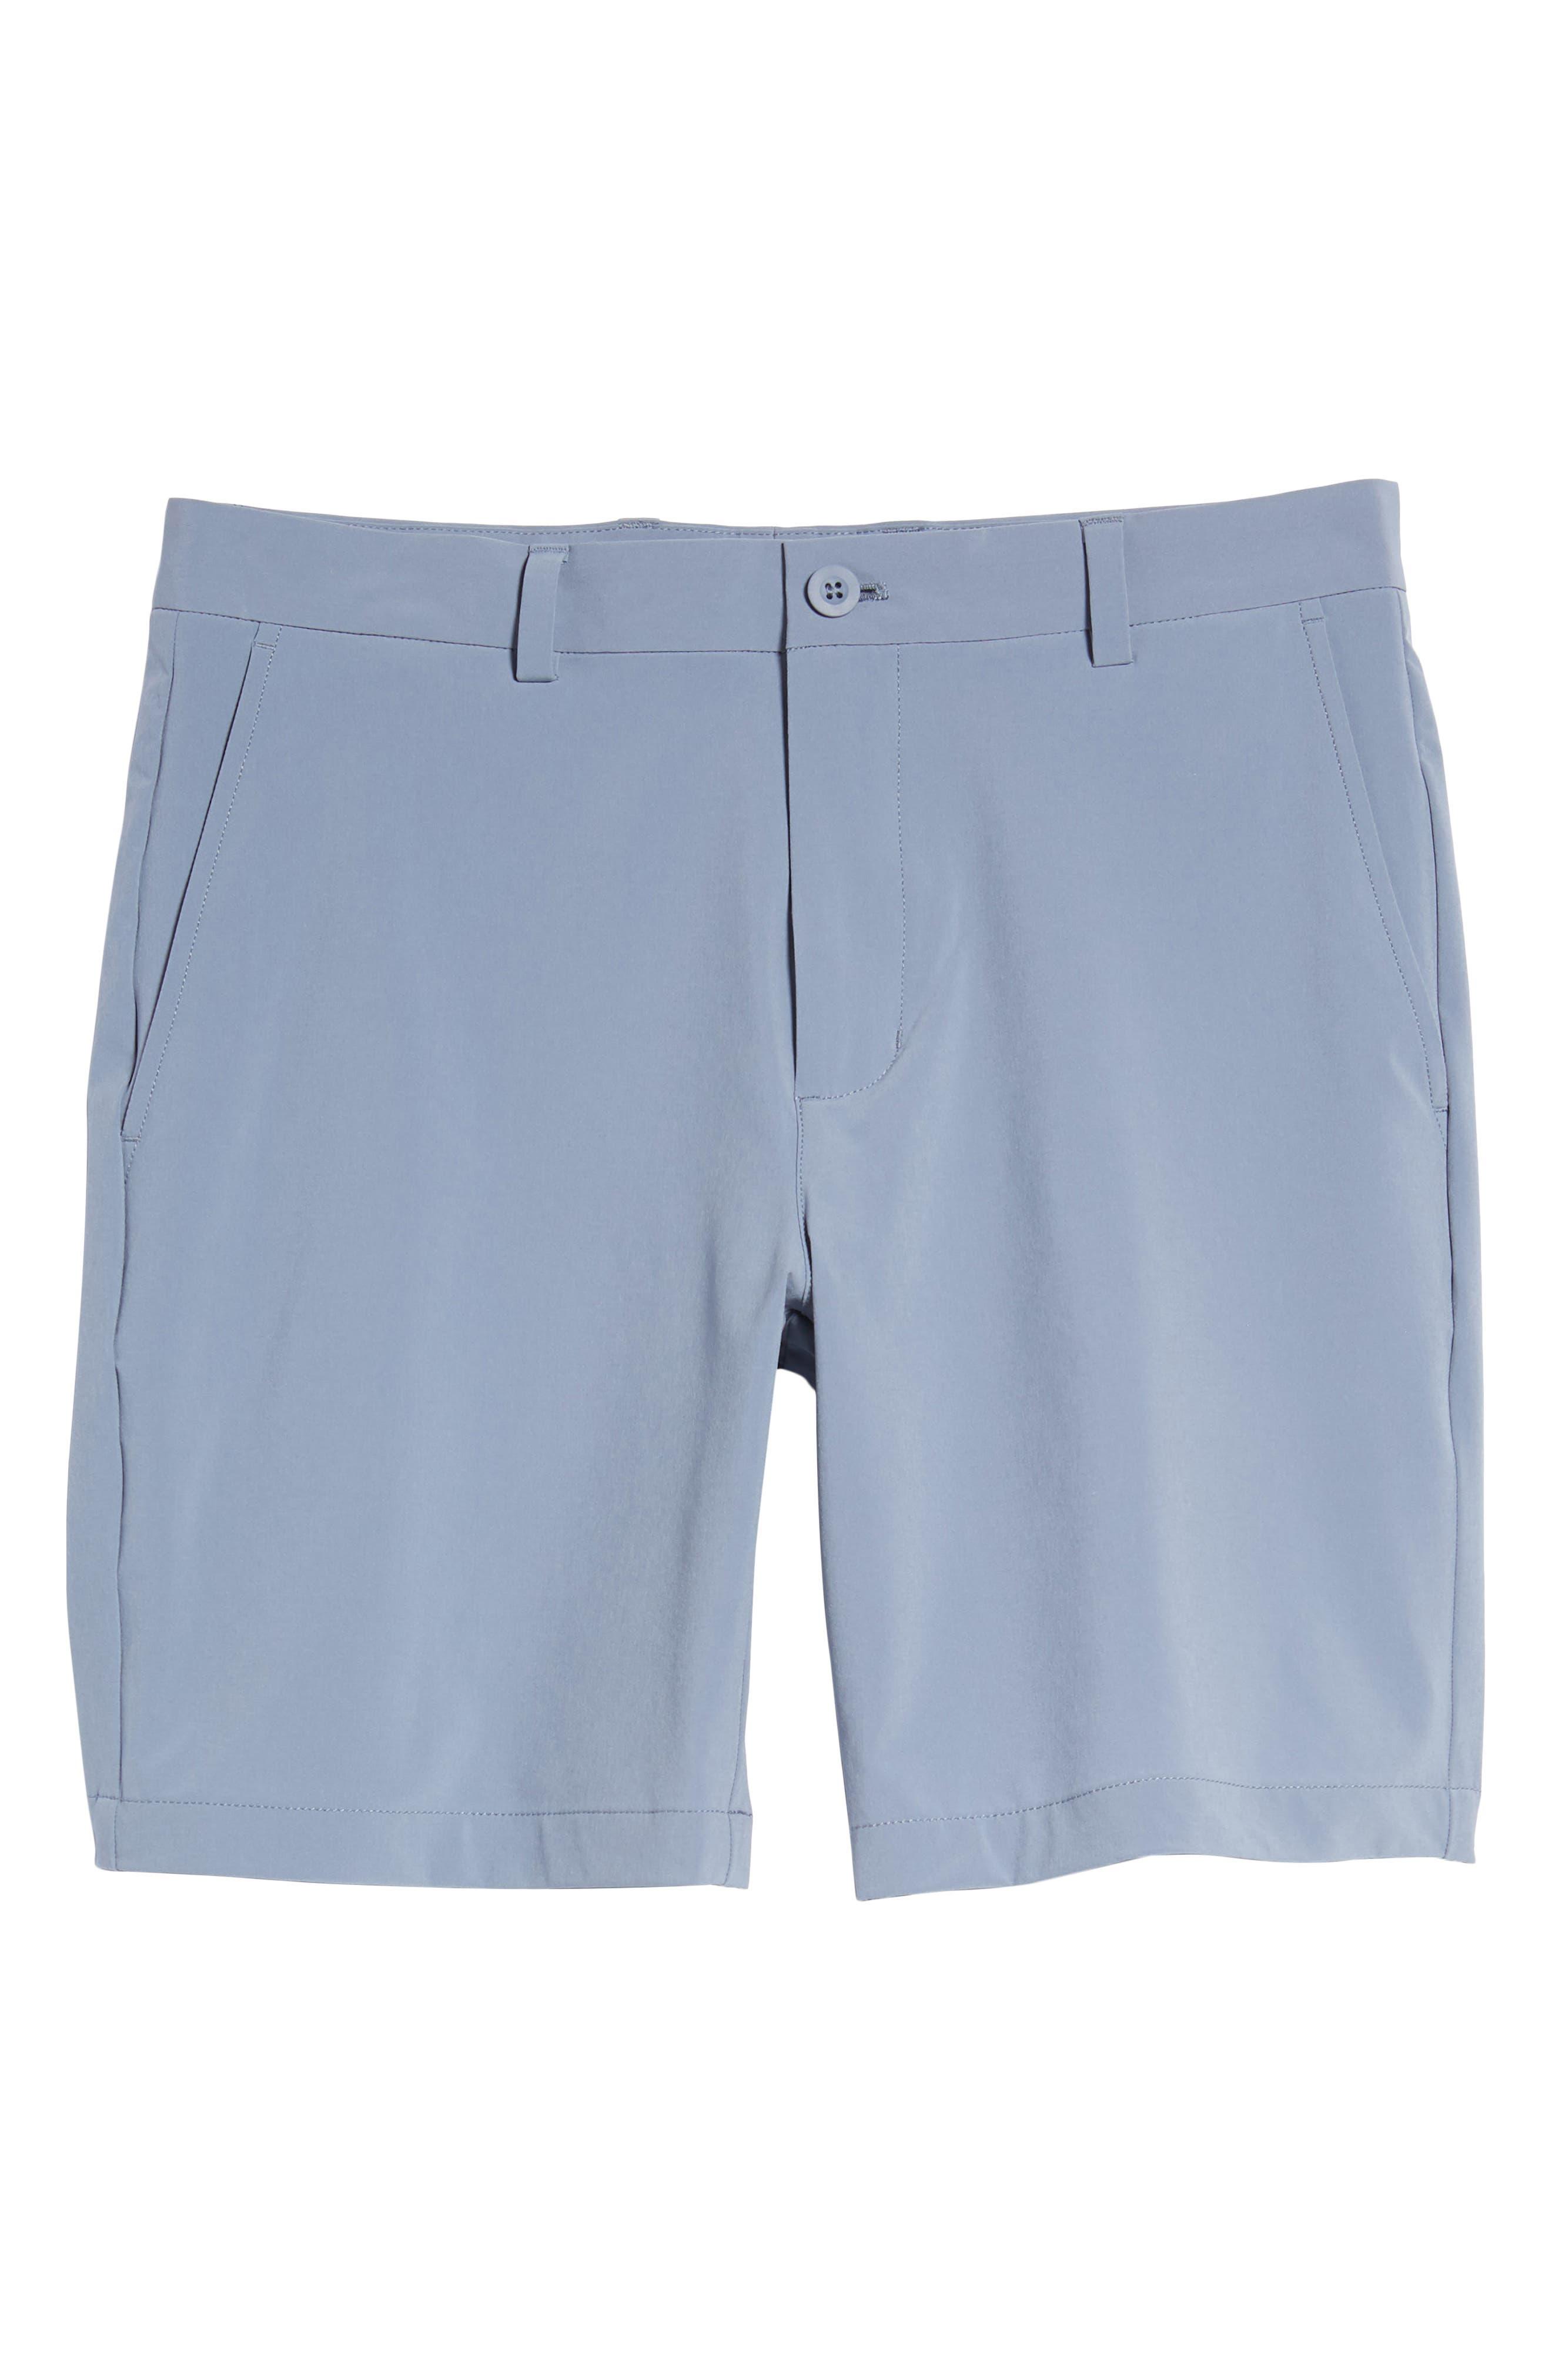 8 Inch Performance Breaker Shorts,                             Alternate thumbnail 6, color,                             423